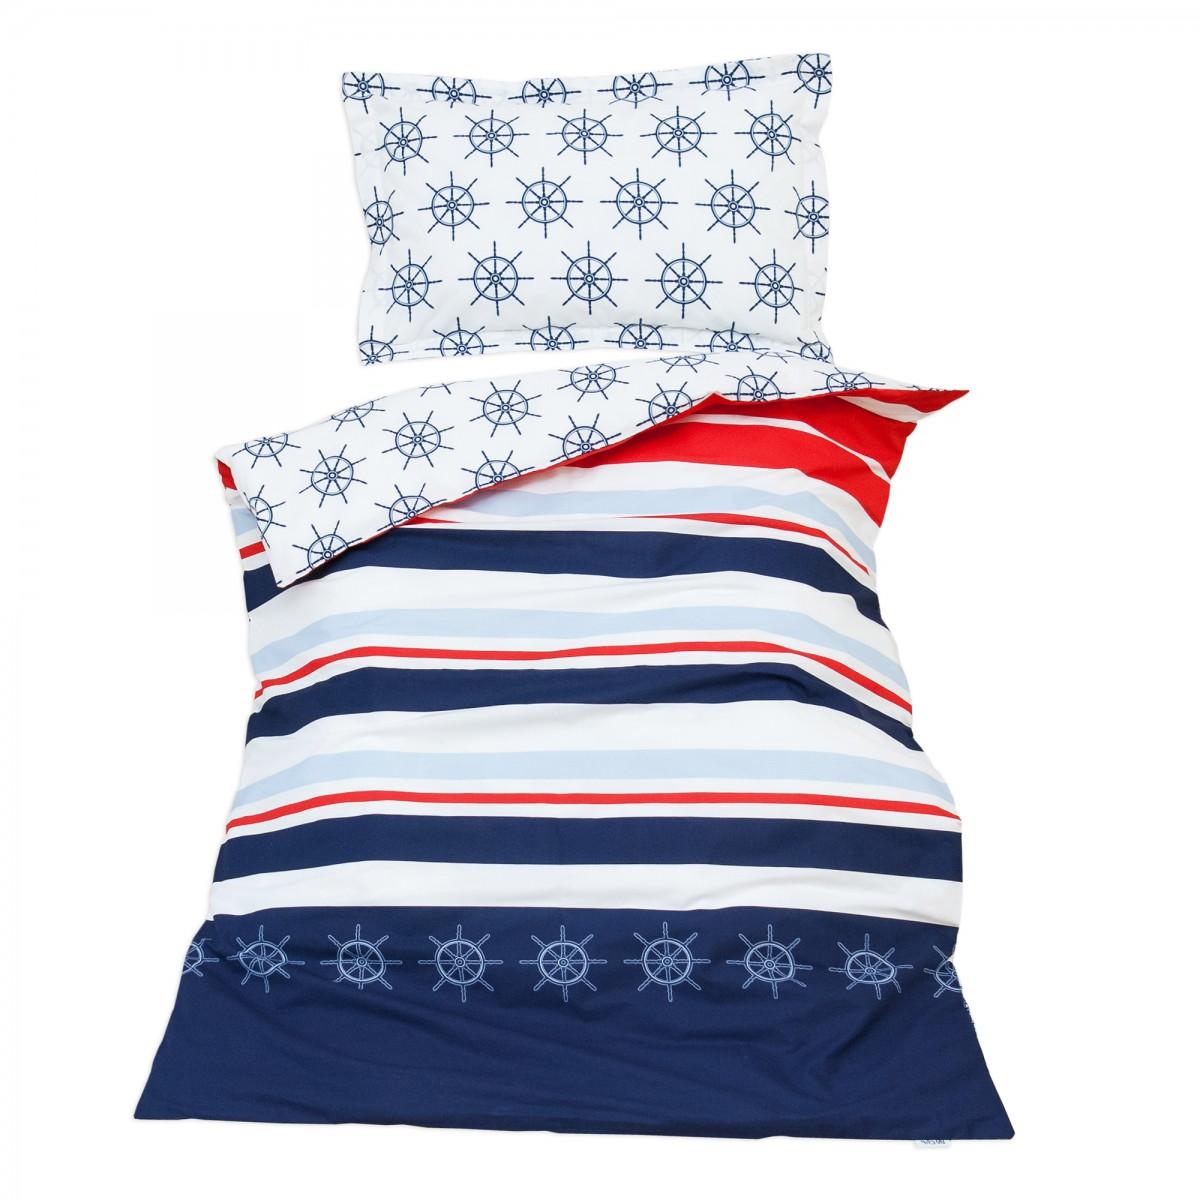 Navy 100 Cotton Cot Crib Set Duvet Cover Amp Pillow